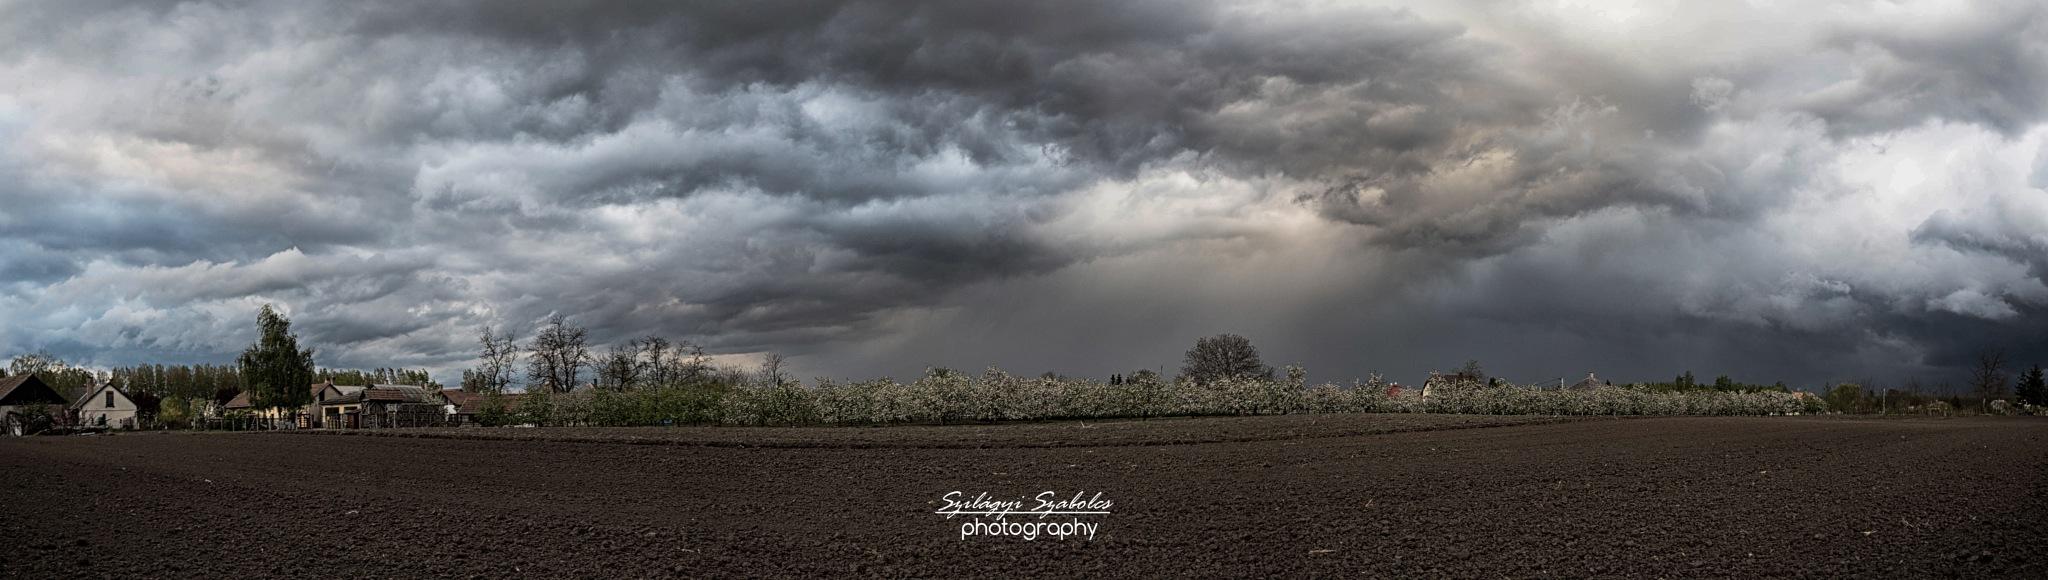 Panorama cloud by Szilágyi Szabolcs